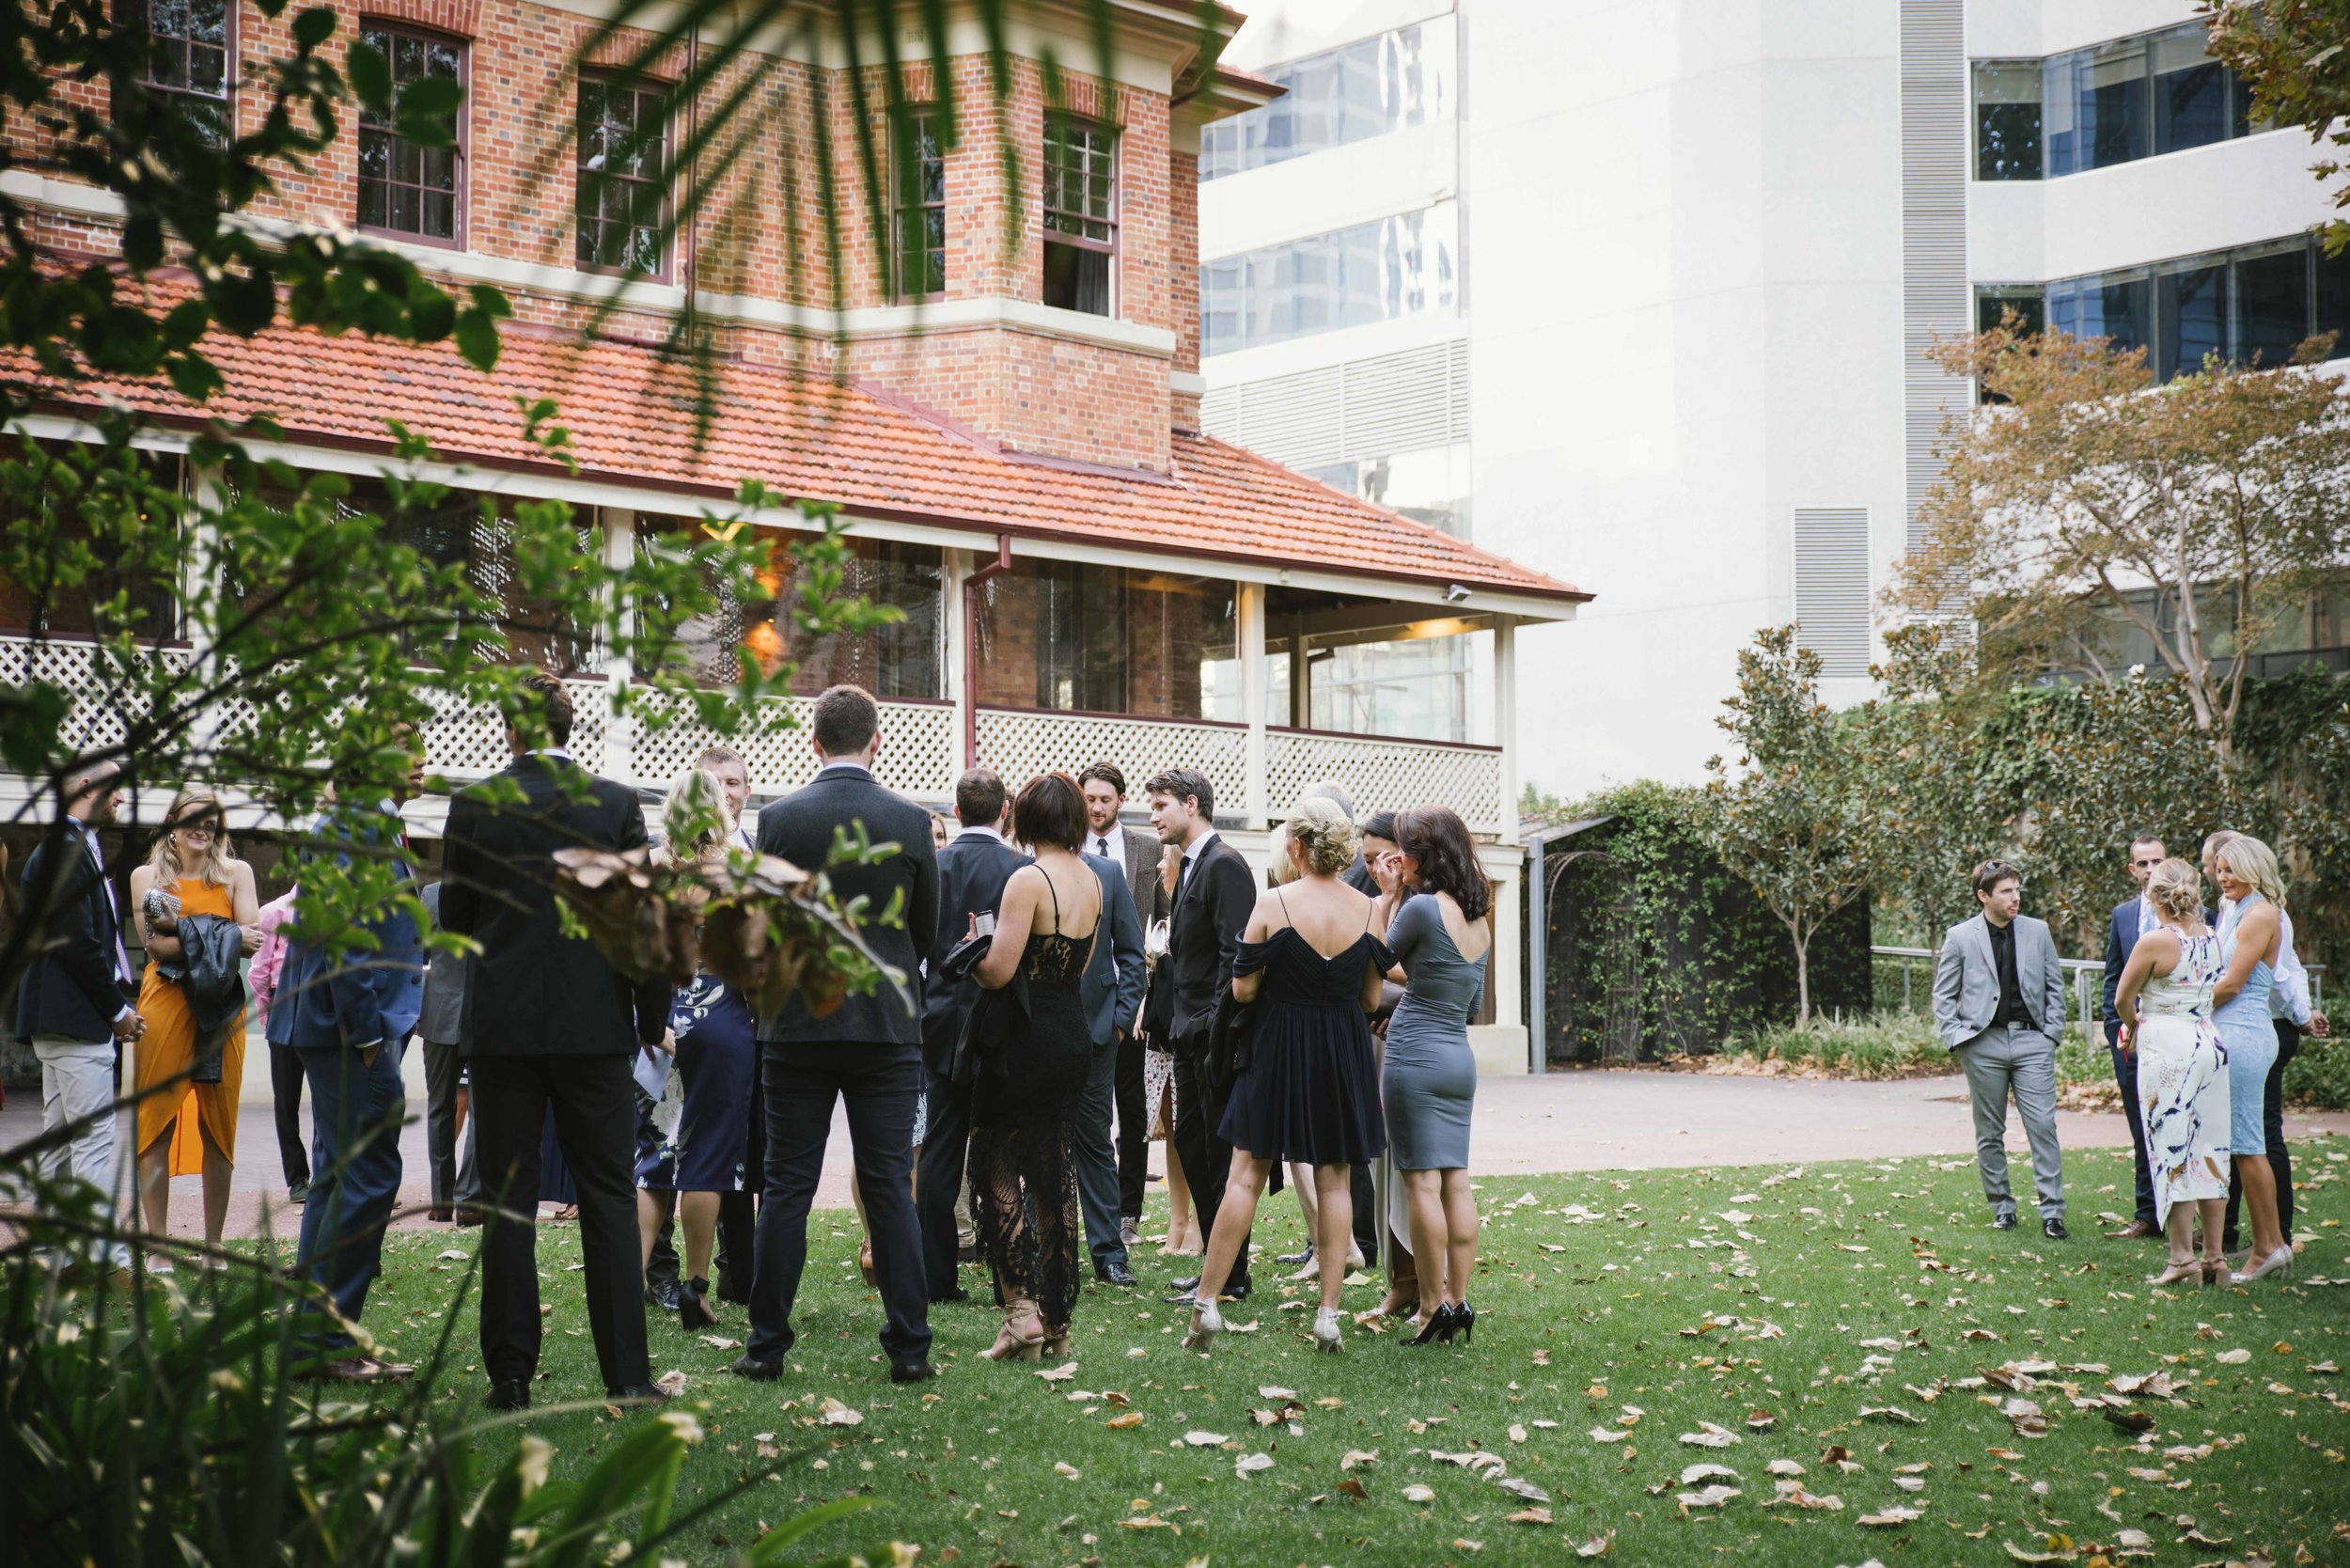 Lamonts Bishops House City Urban Perth Wheatbelt Avon Valley Wedding Photographer Photography (8).jpg